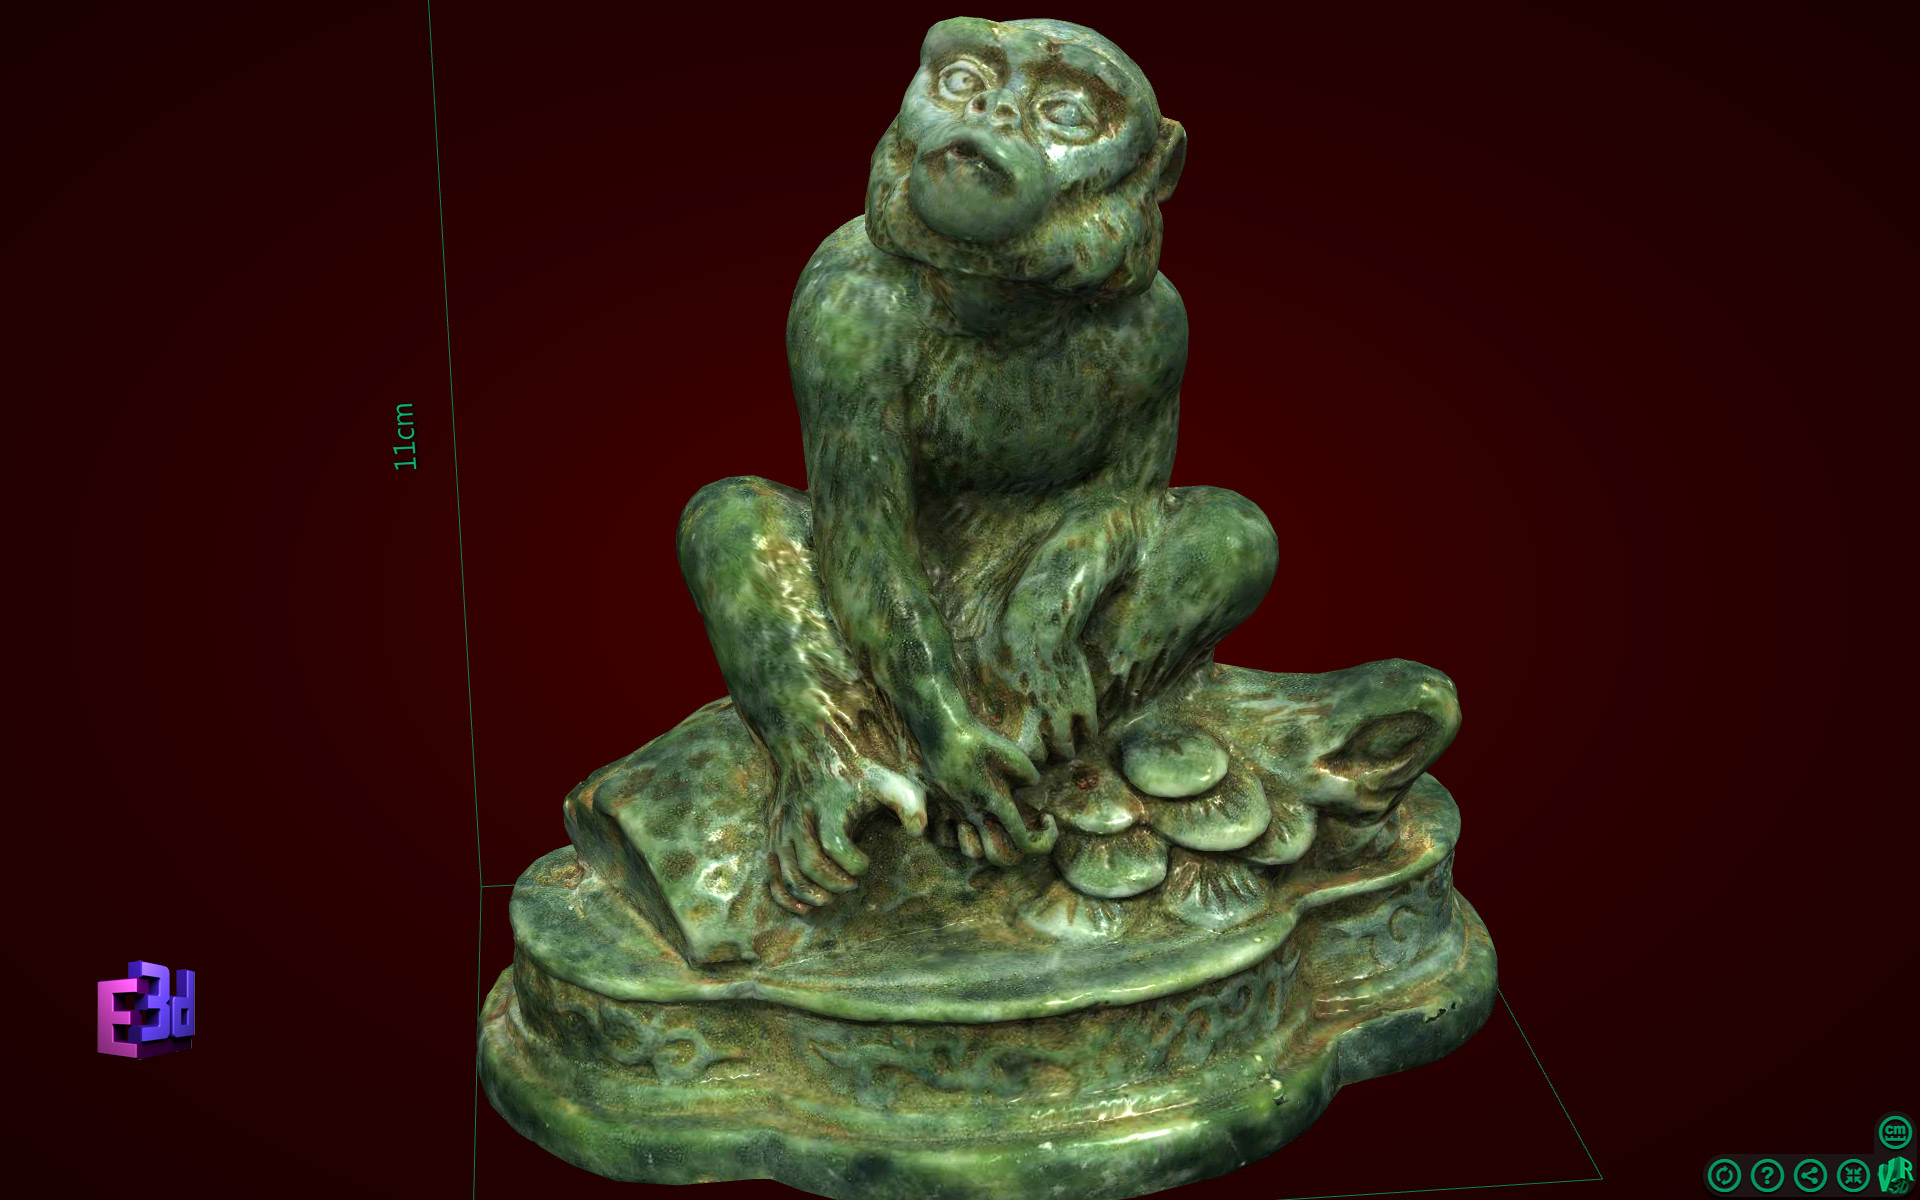 Khỉ giáp bé